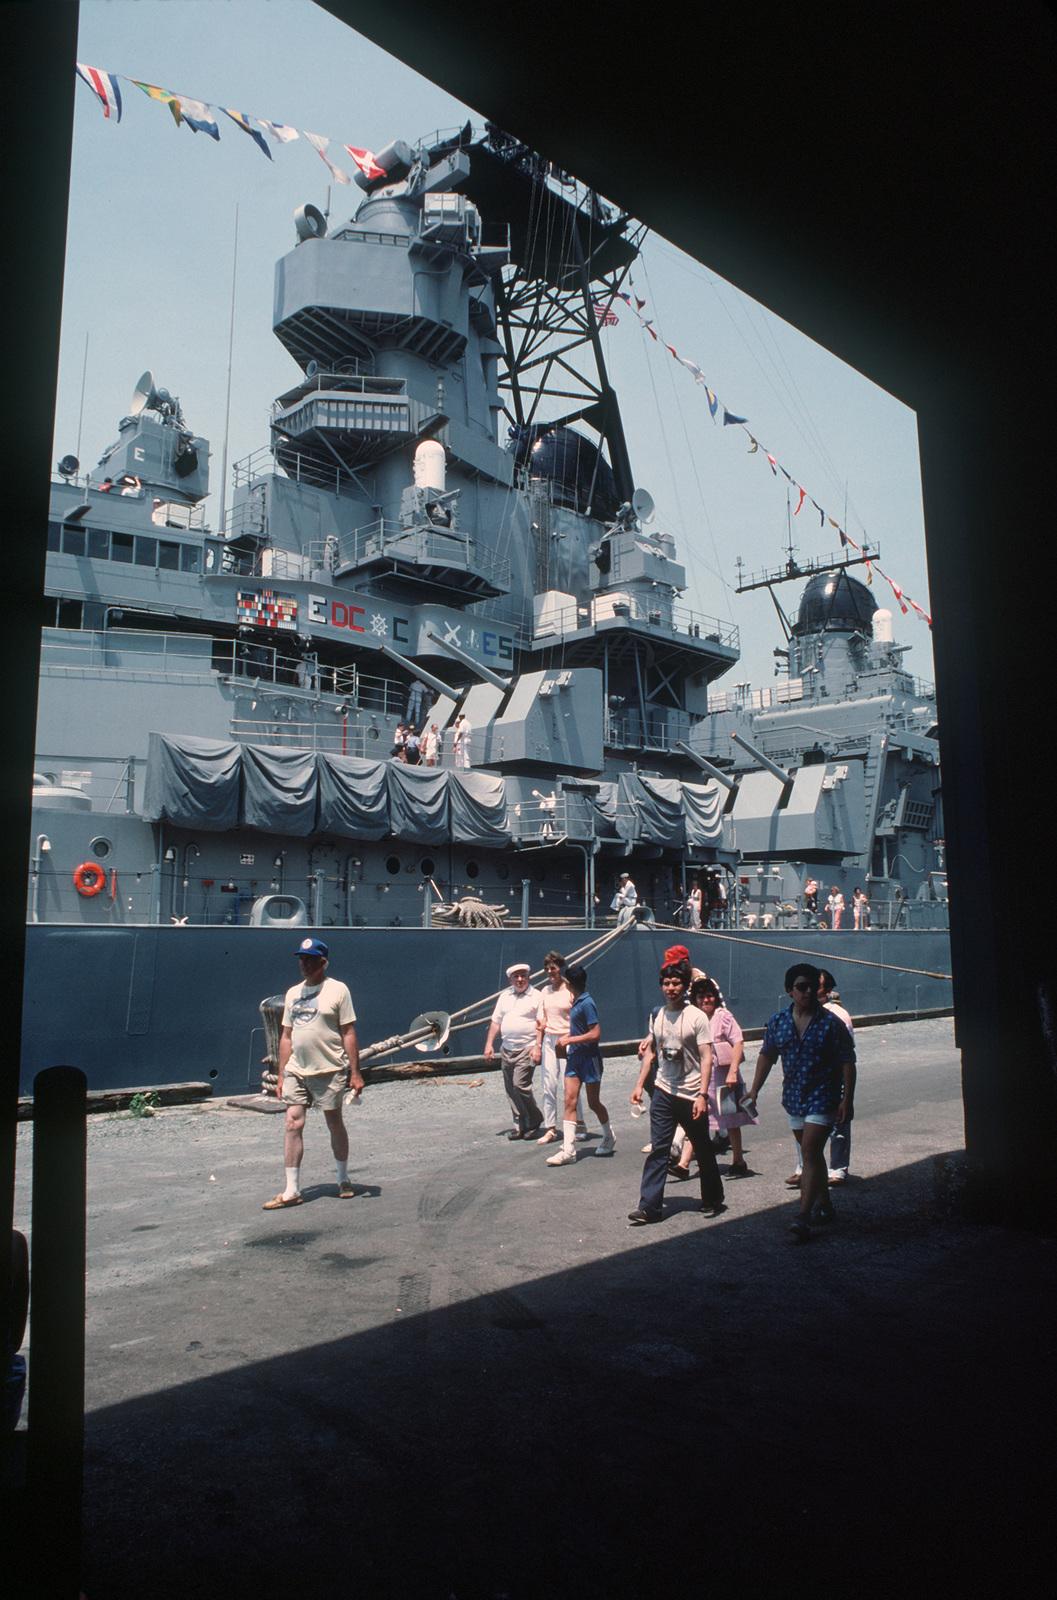 Tourists visit aboard the battleship USS IOWA (BB 61) during